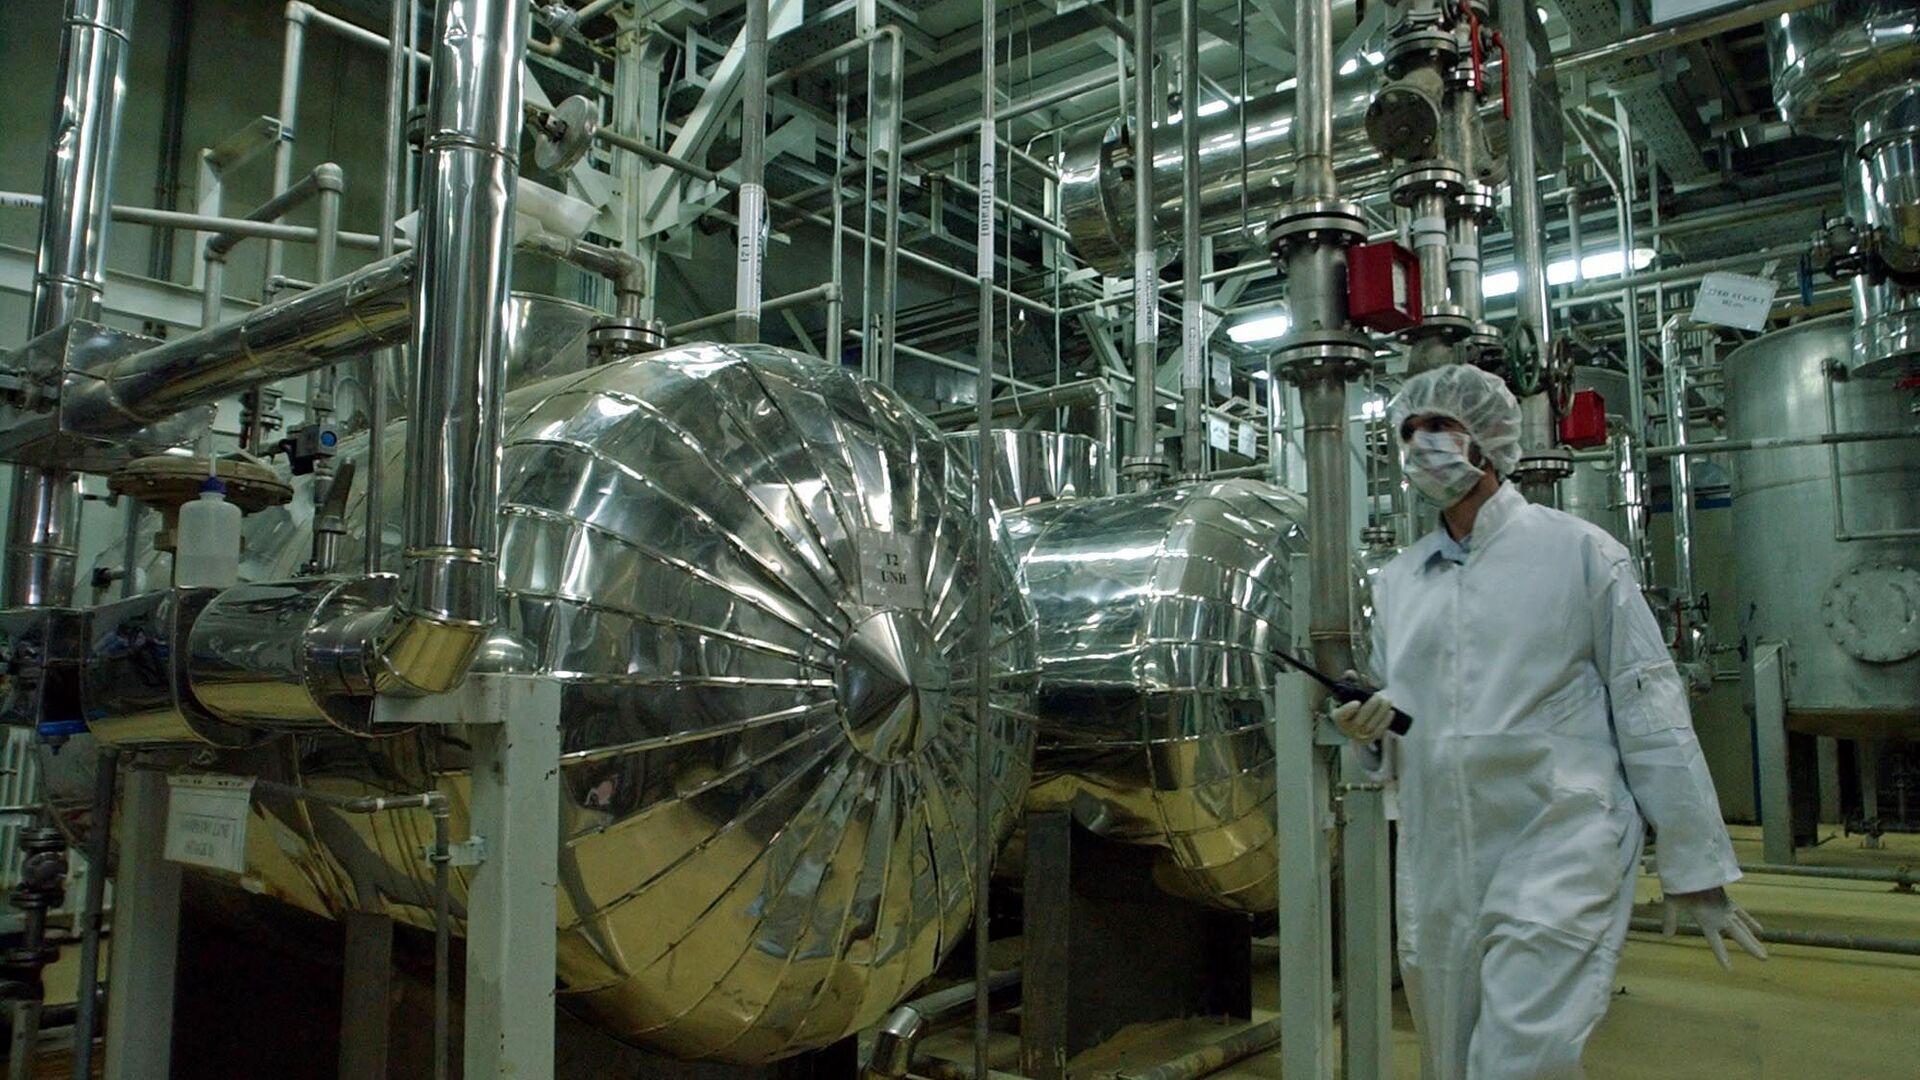 Un impianto nucleare in Iran - Sputnik Italia, 1920, 05.03.2021